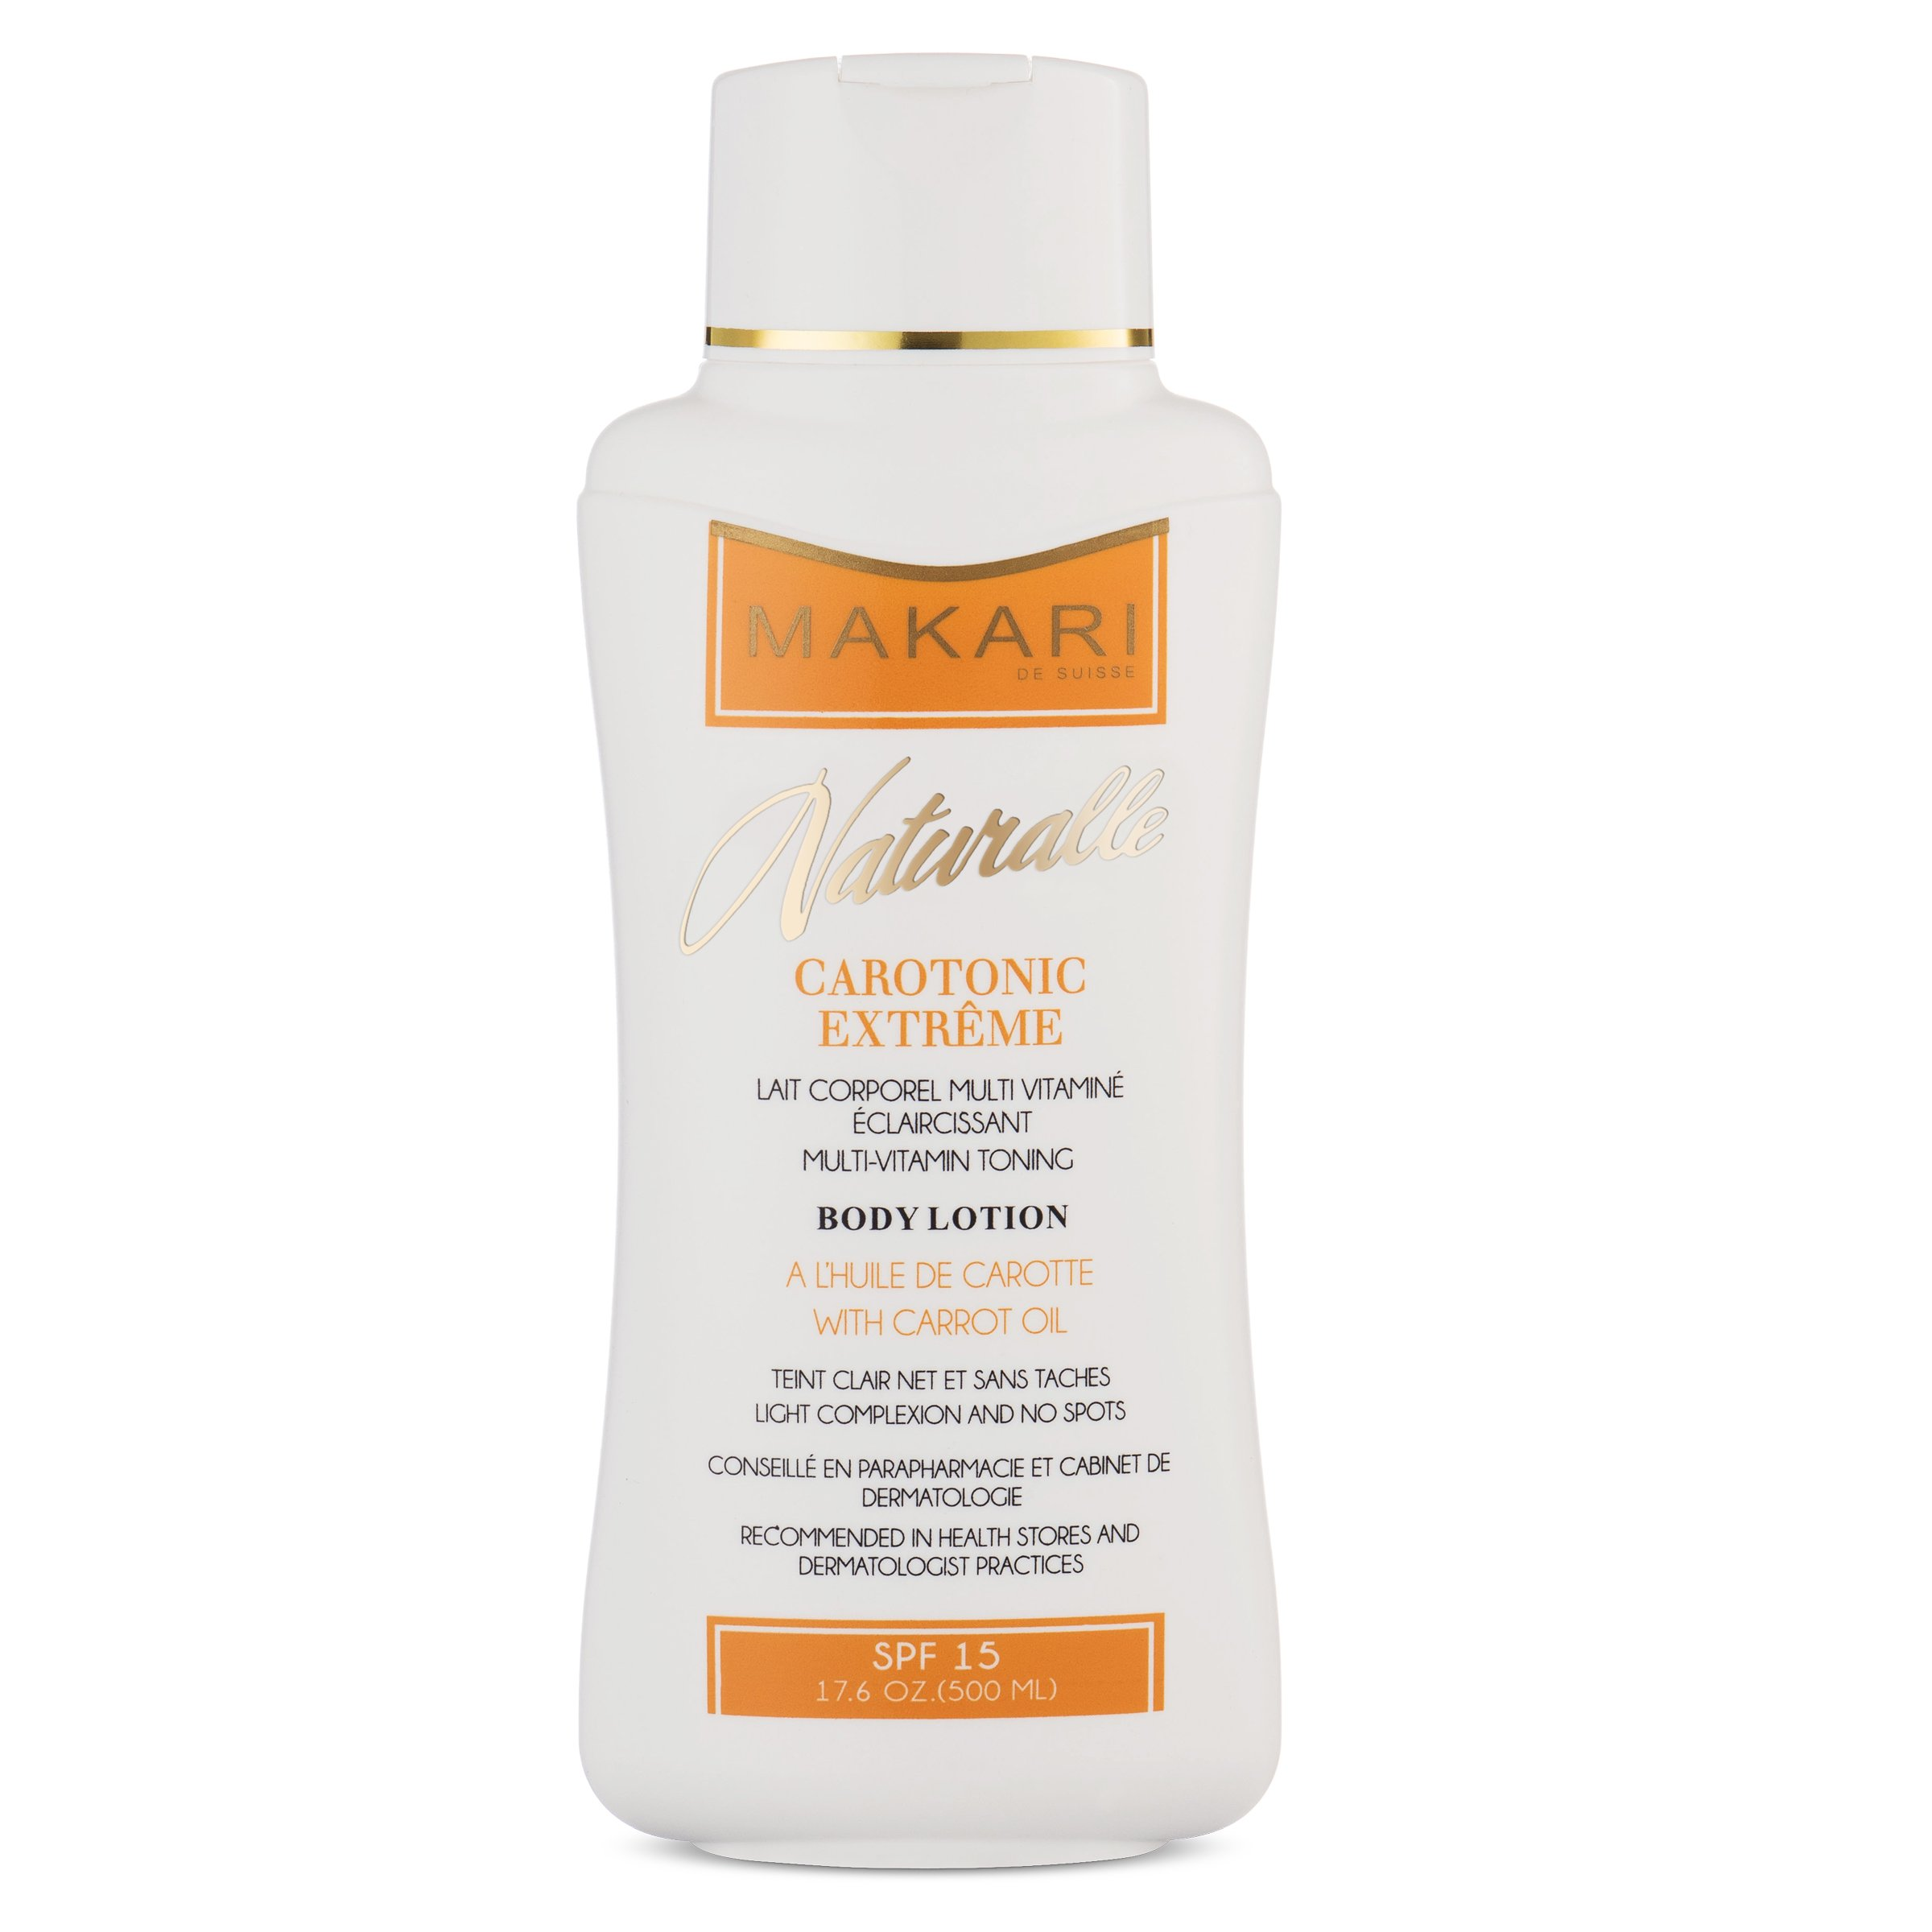 Makari Naturalle Carotonic Extreme Body Lotion 17.6oz – Lightening, Toning & Moisturizing Body Cream With Carrot Oil & SPF 15 – Anti-Aging & Whitening Treatment for Dark Spots, Acne Scars